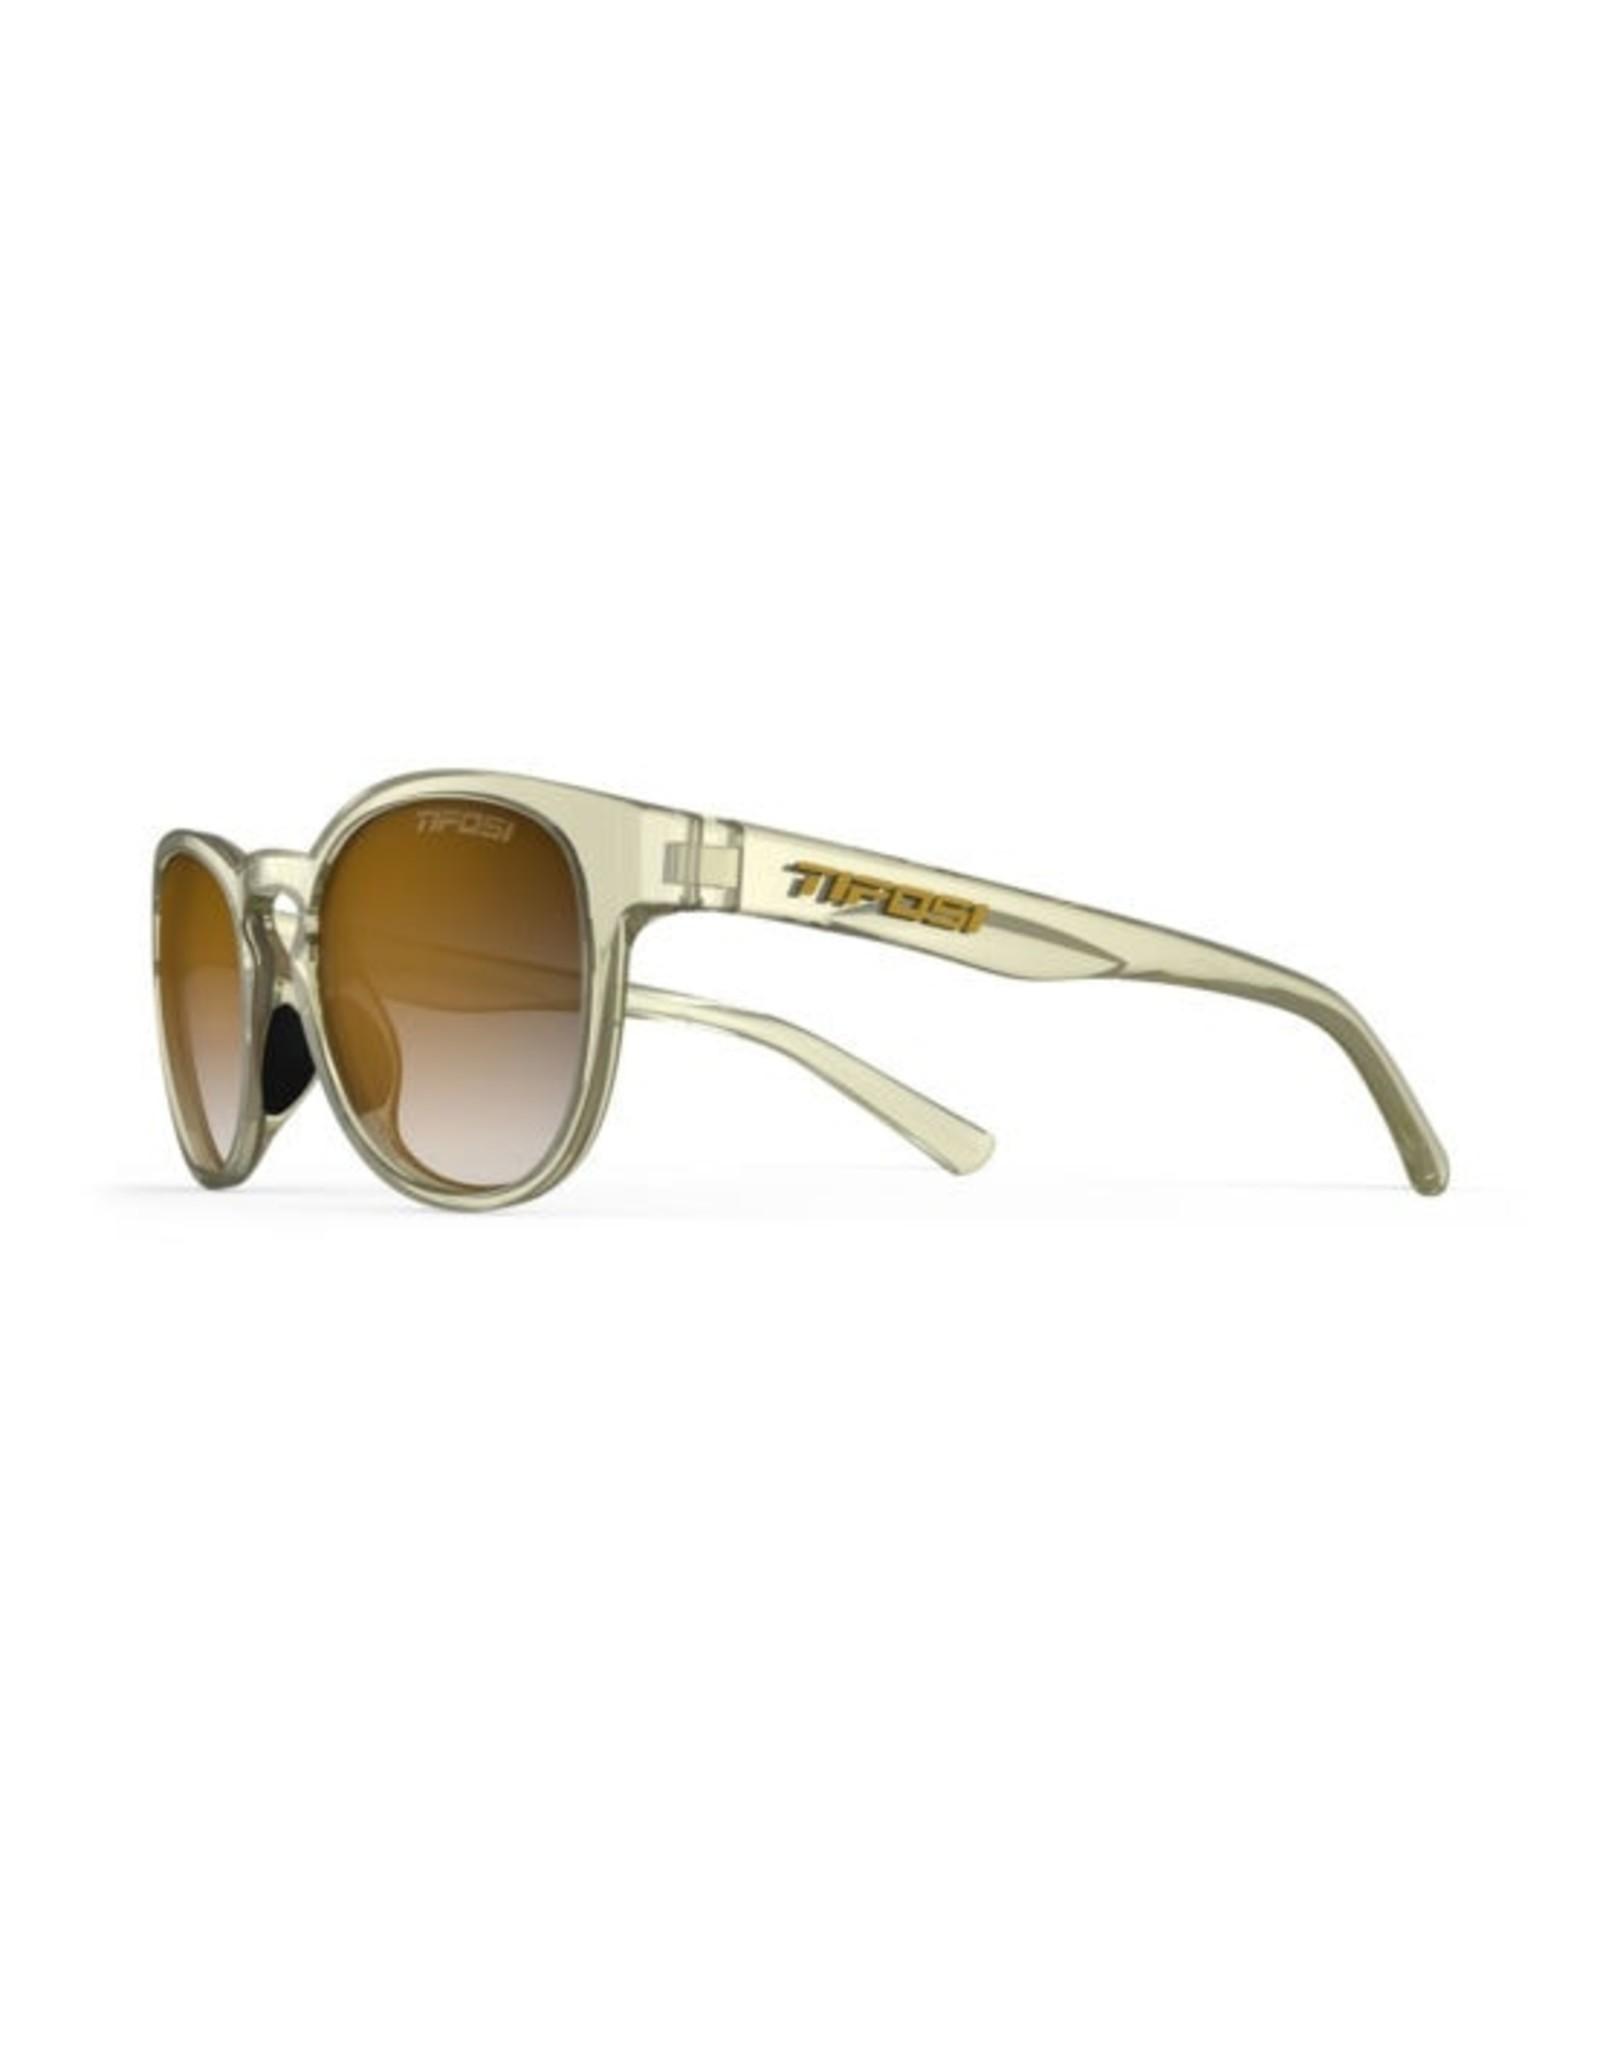 Tifosi Optics Svago, Crystal Champagne Single Lens Sunglasses